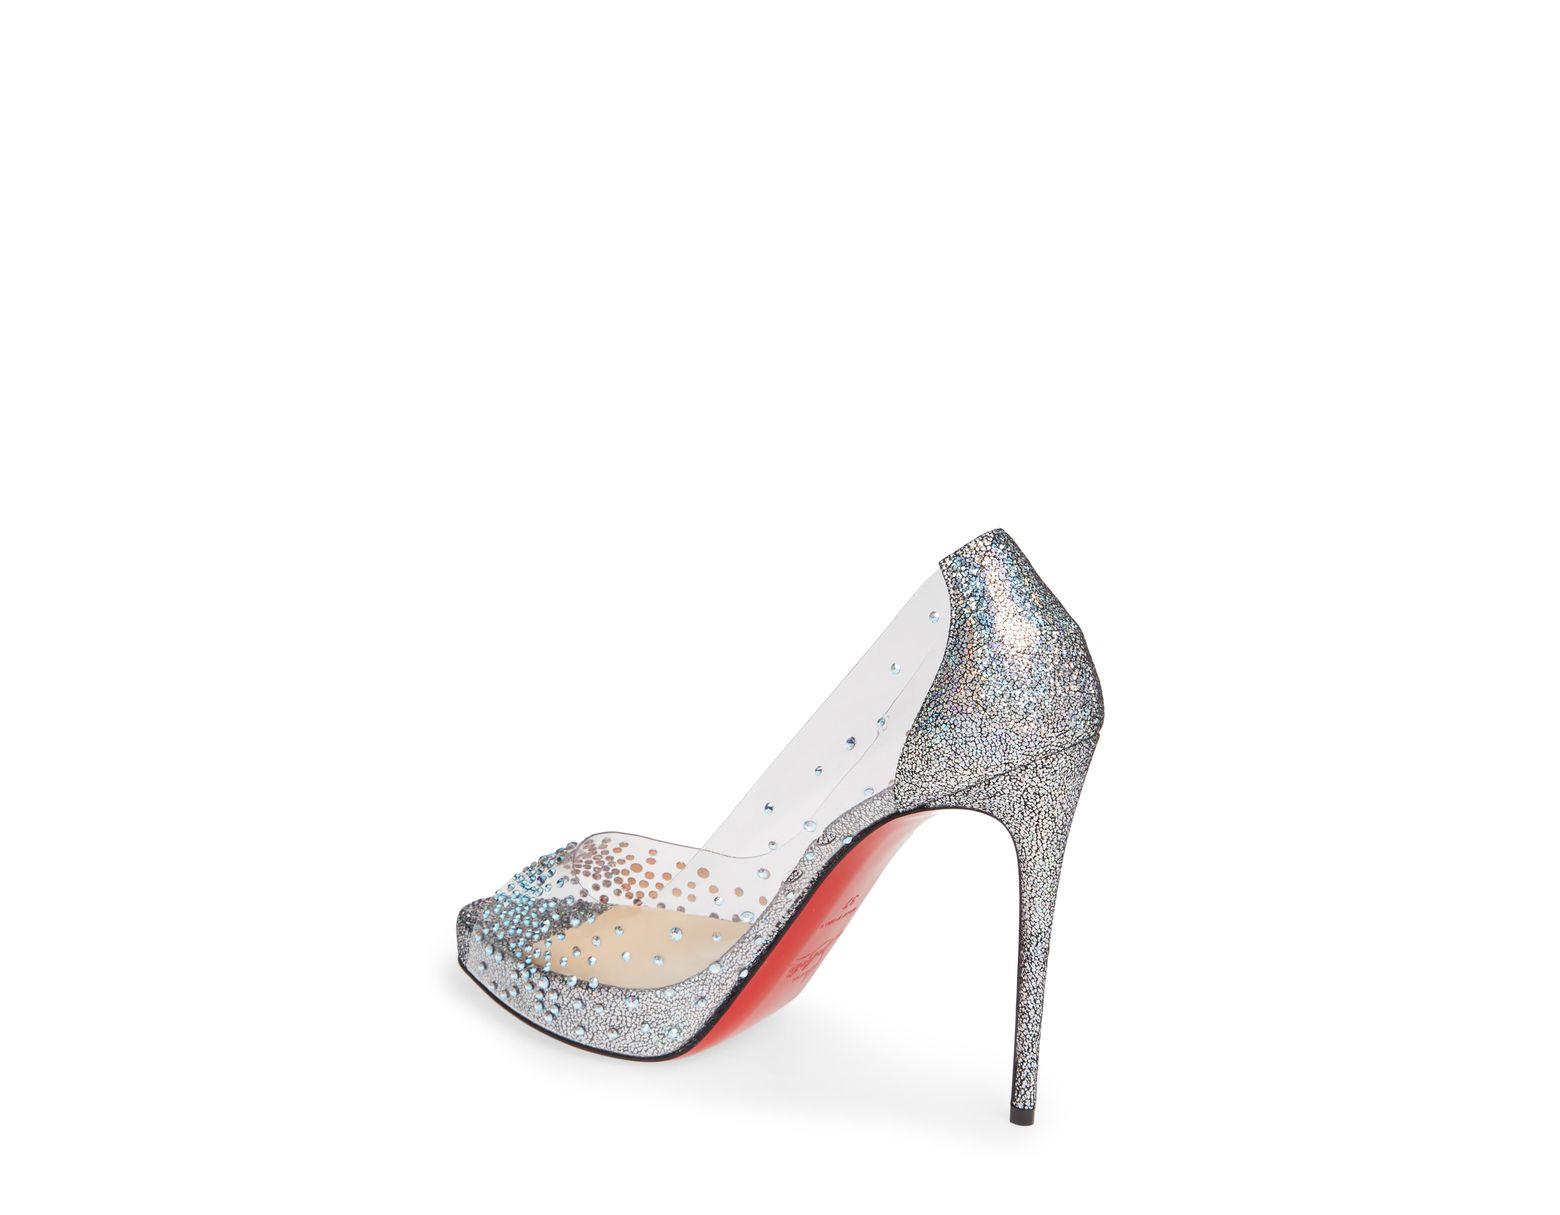 c751f6f7da8 Women's Metallic Very Strass Embellished Peep Toe Pump